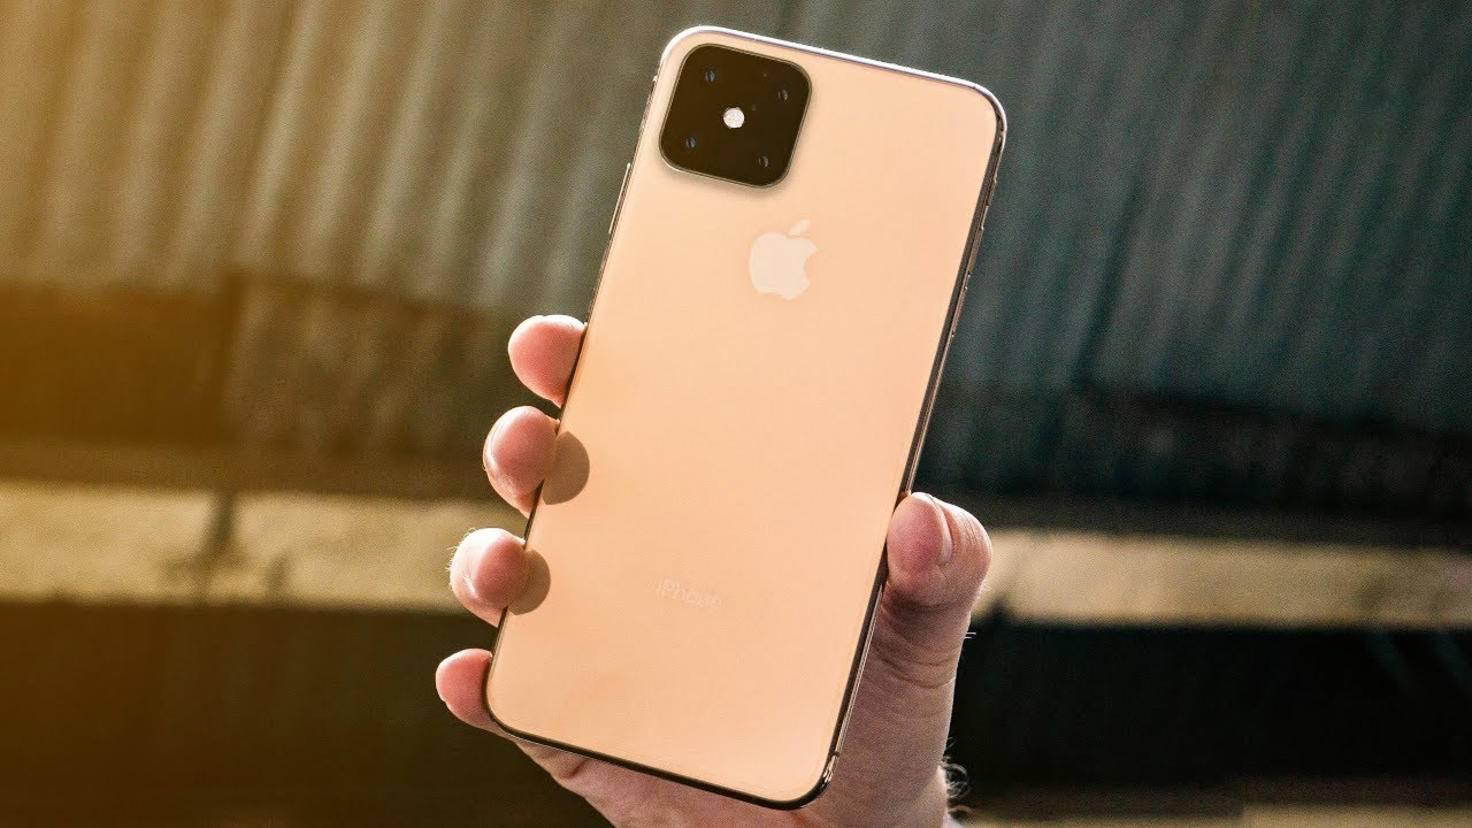 iphone-2019-concept-new